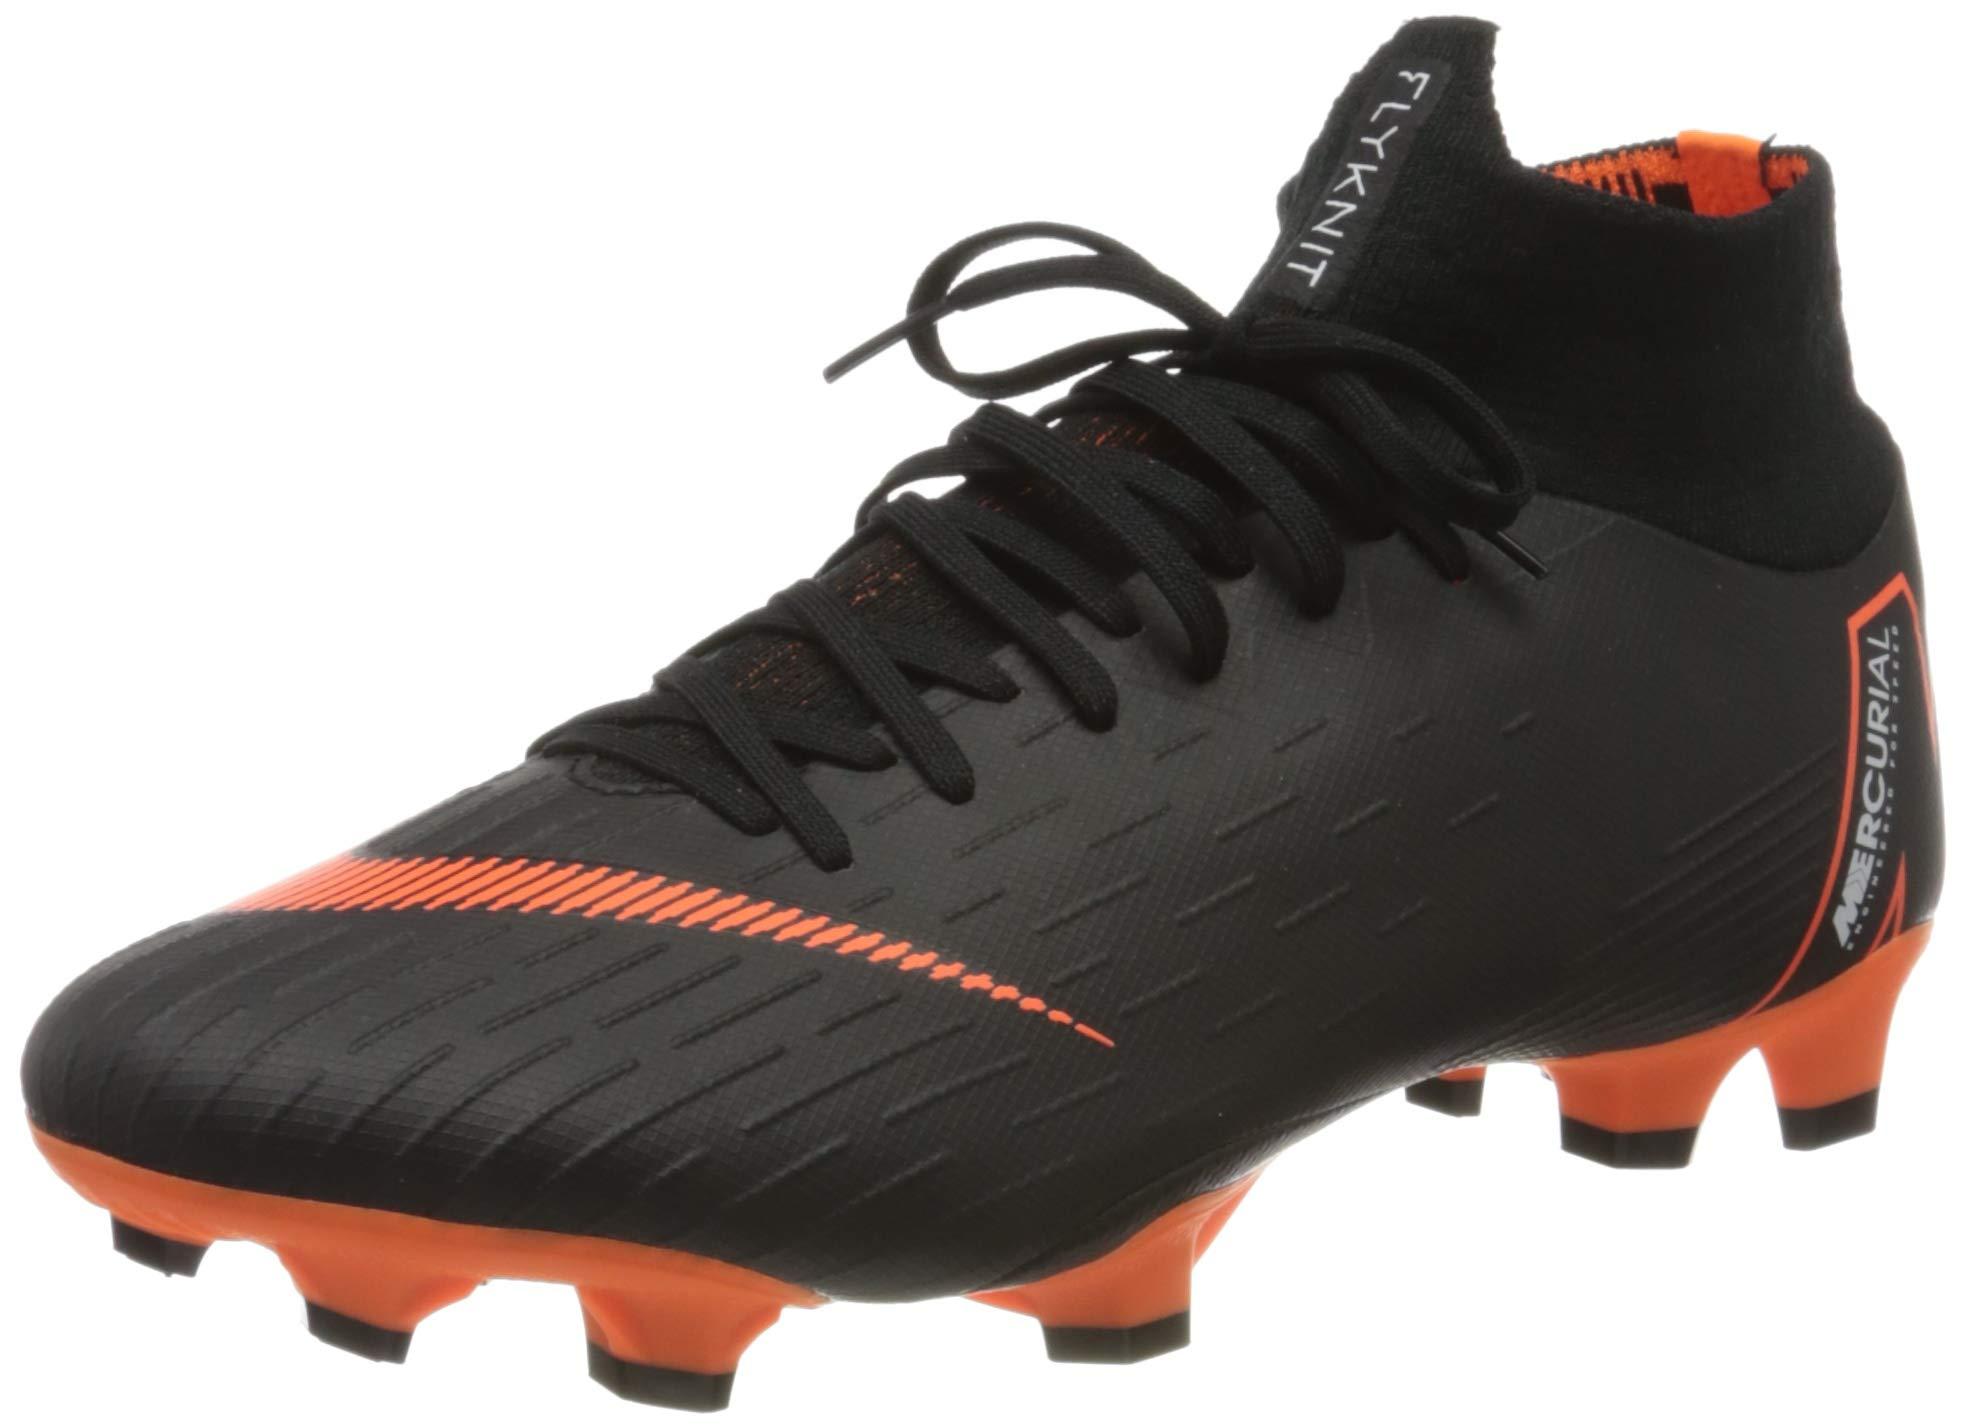 Nike Men's Mercurial Superfly VI Academy MG Football Boots